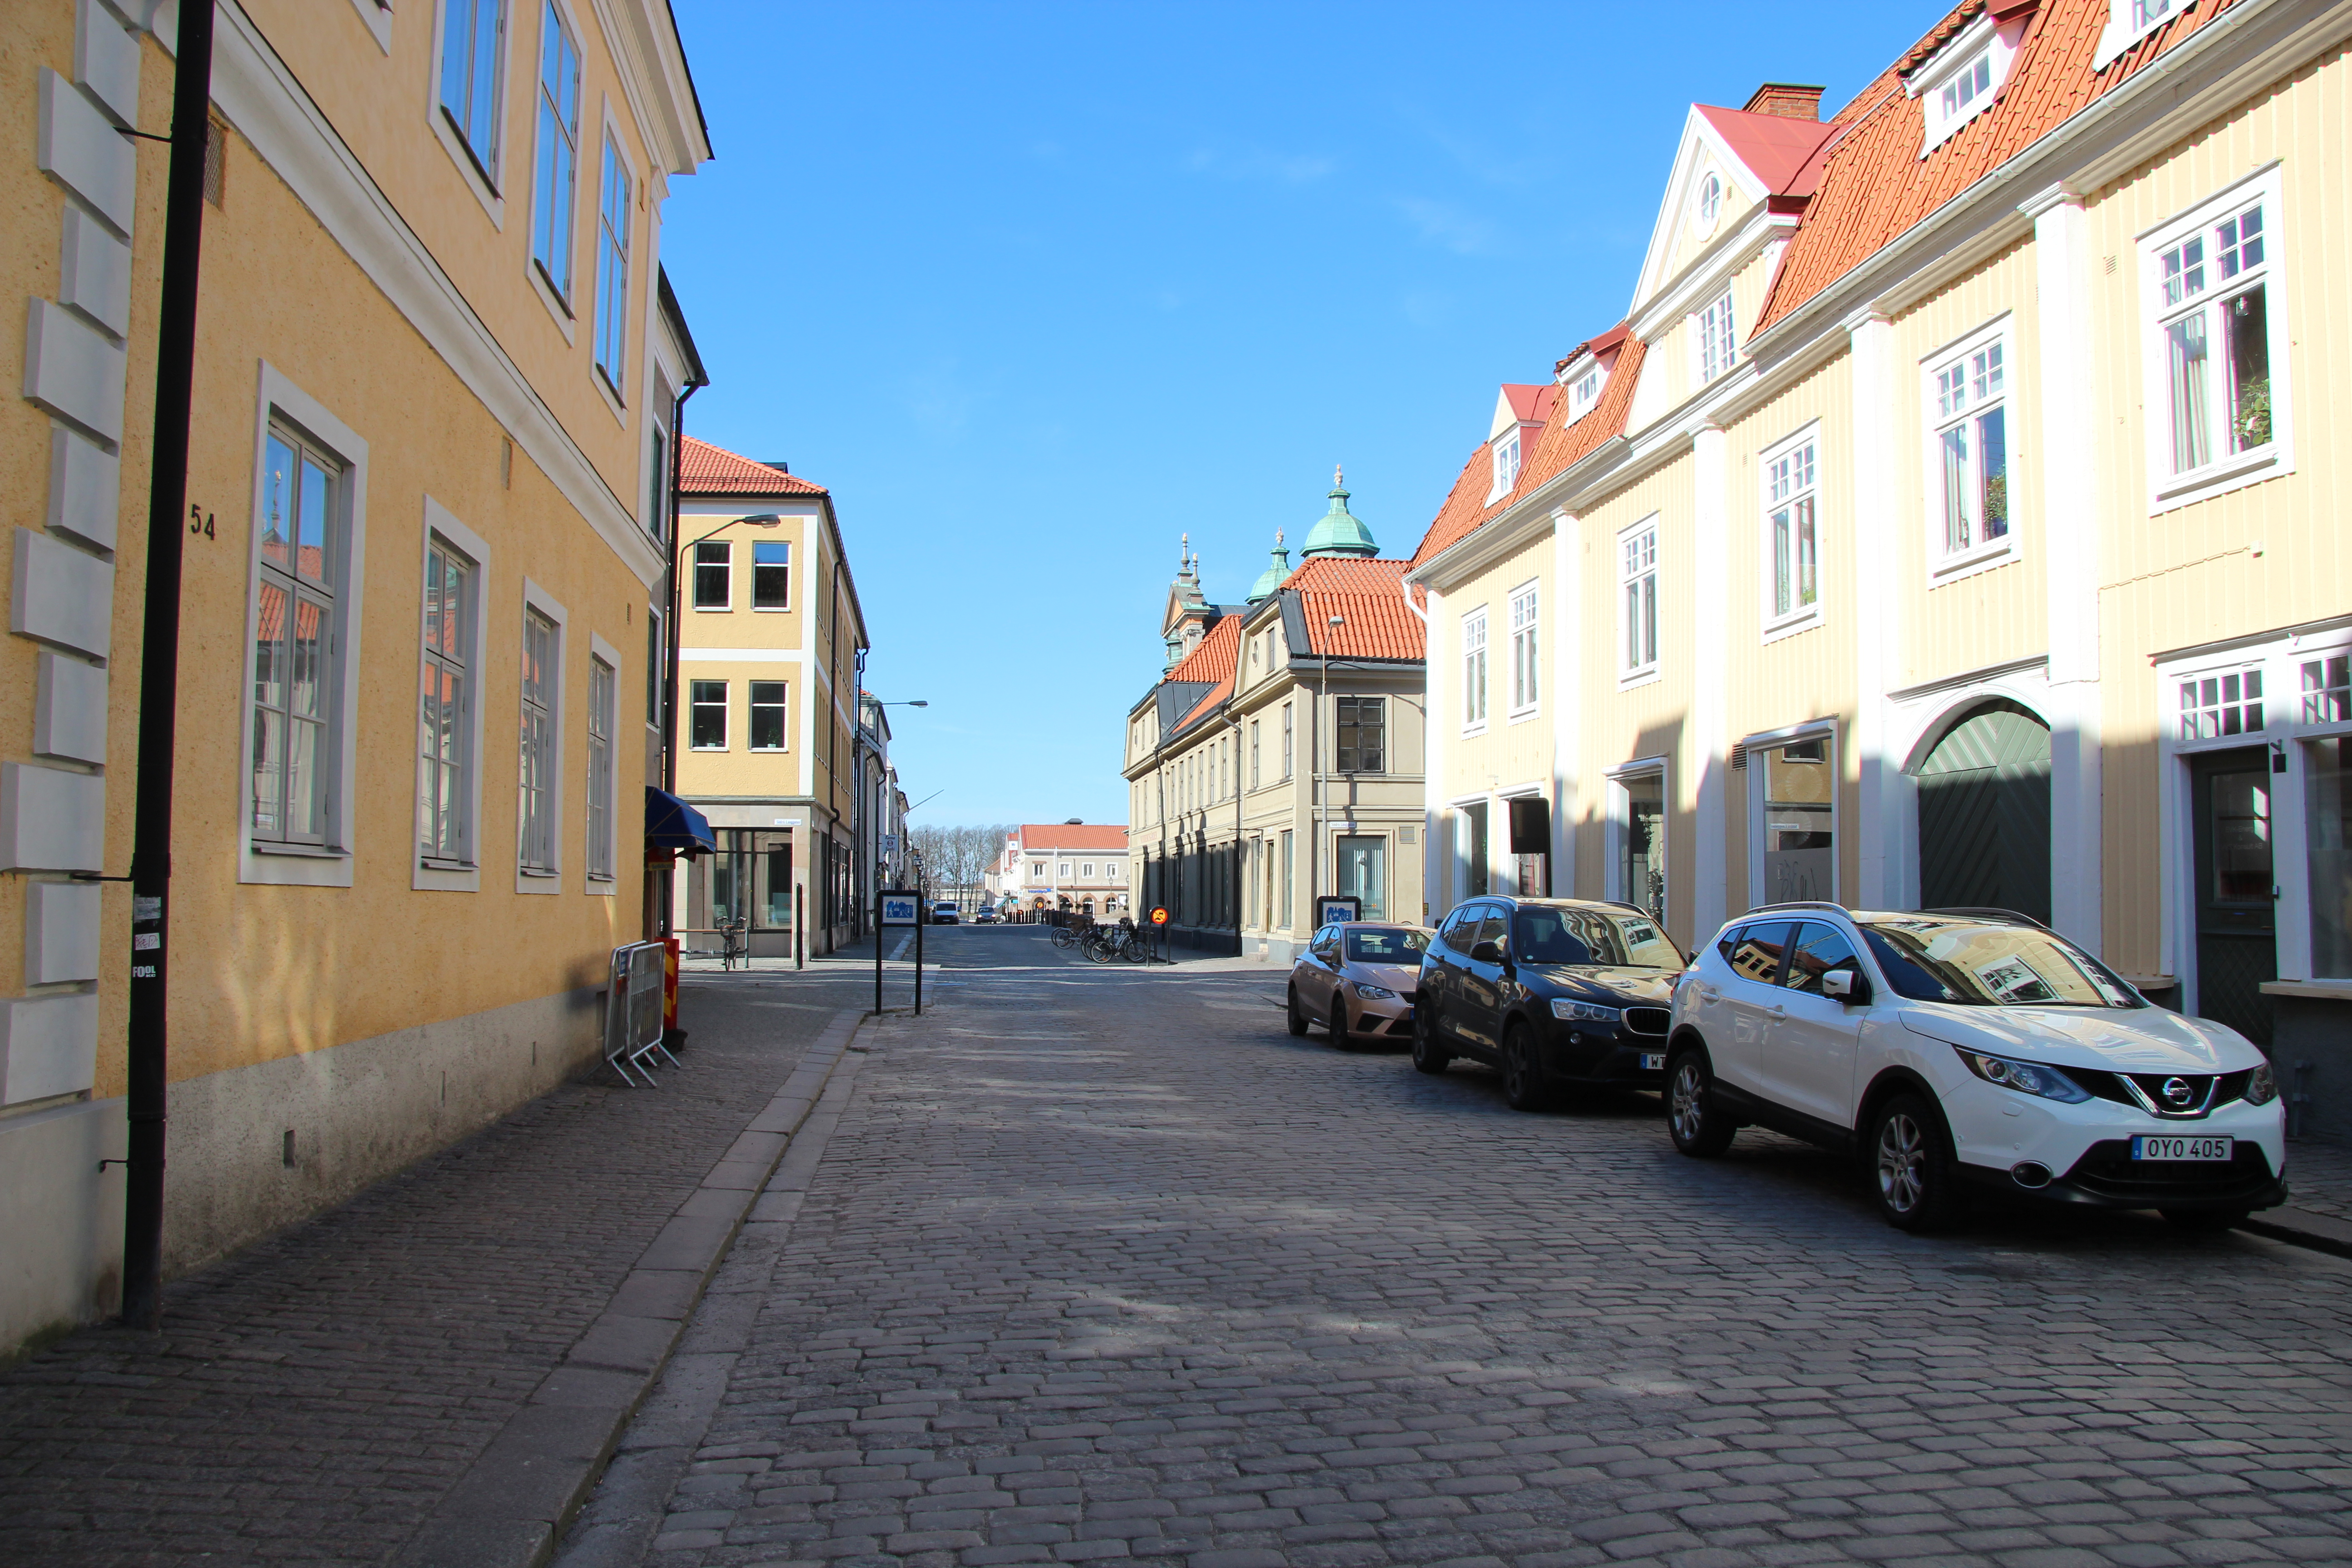 En folktom gata i Kalmar.